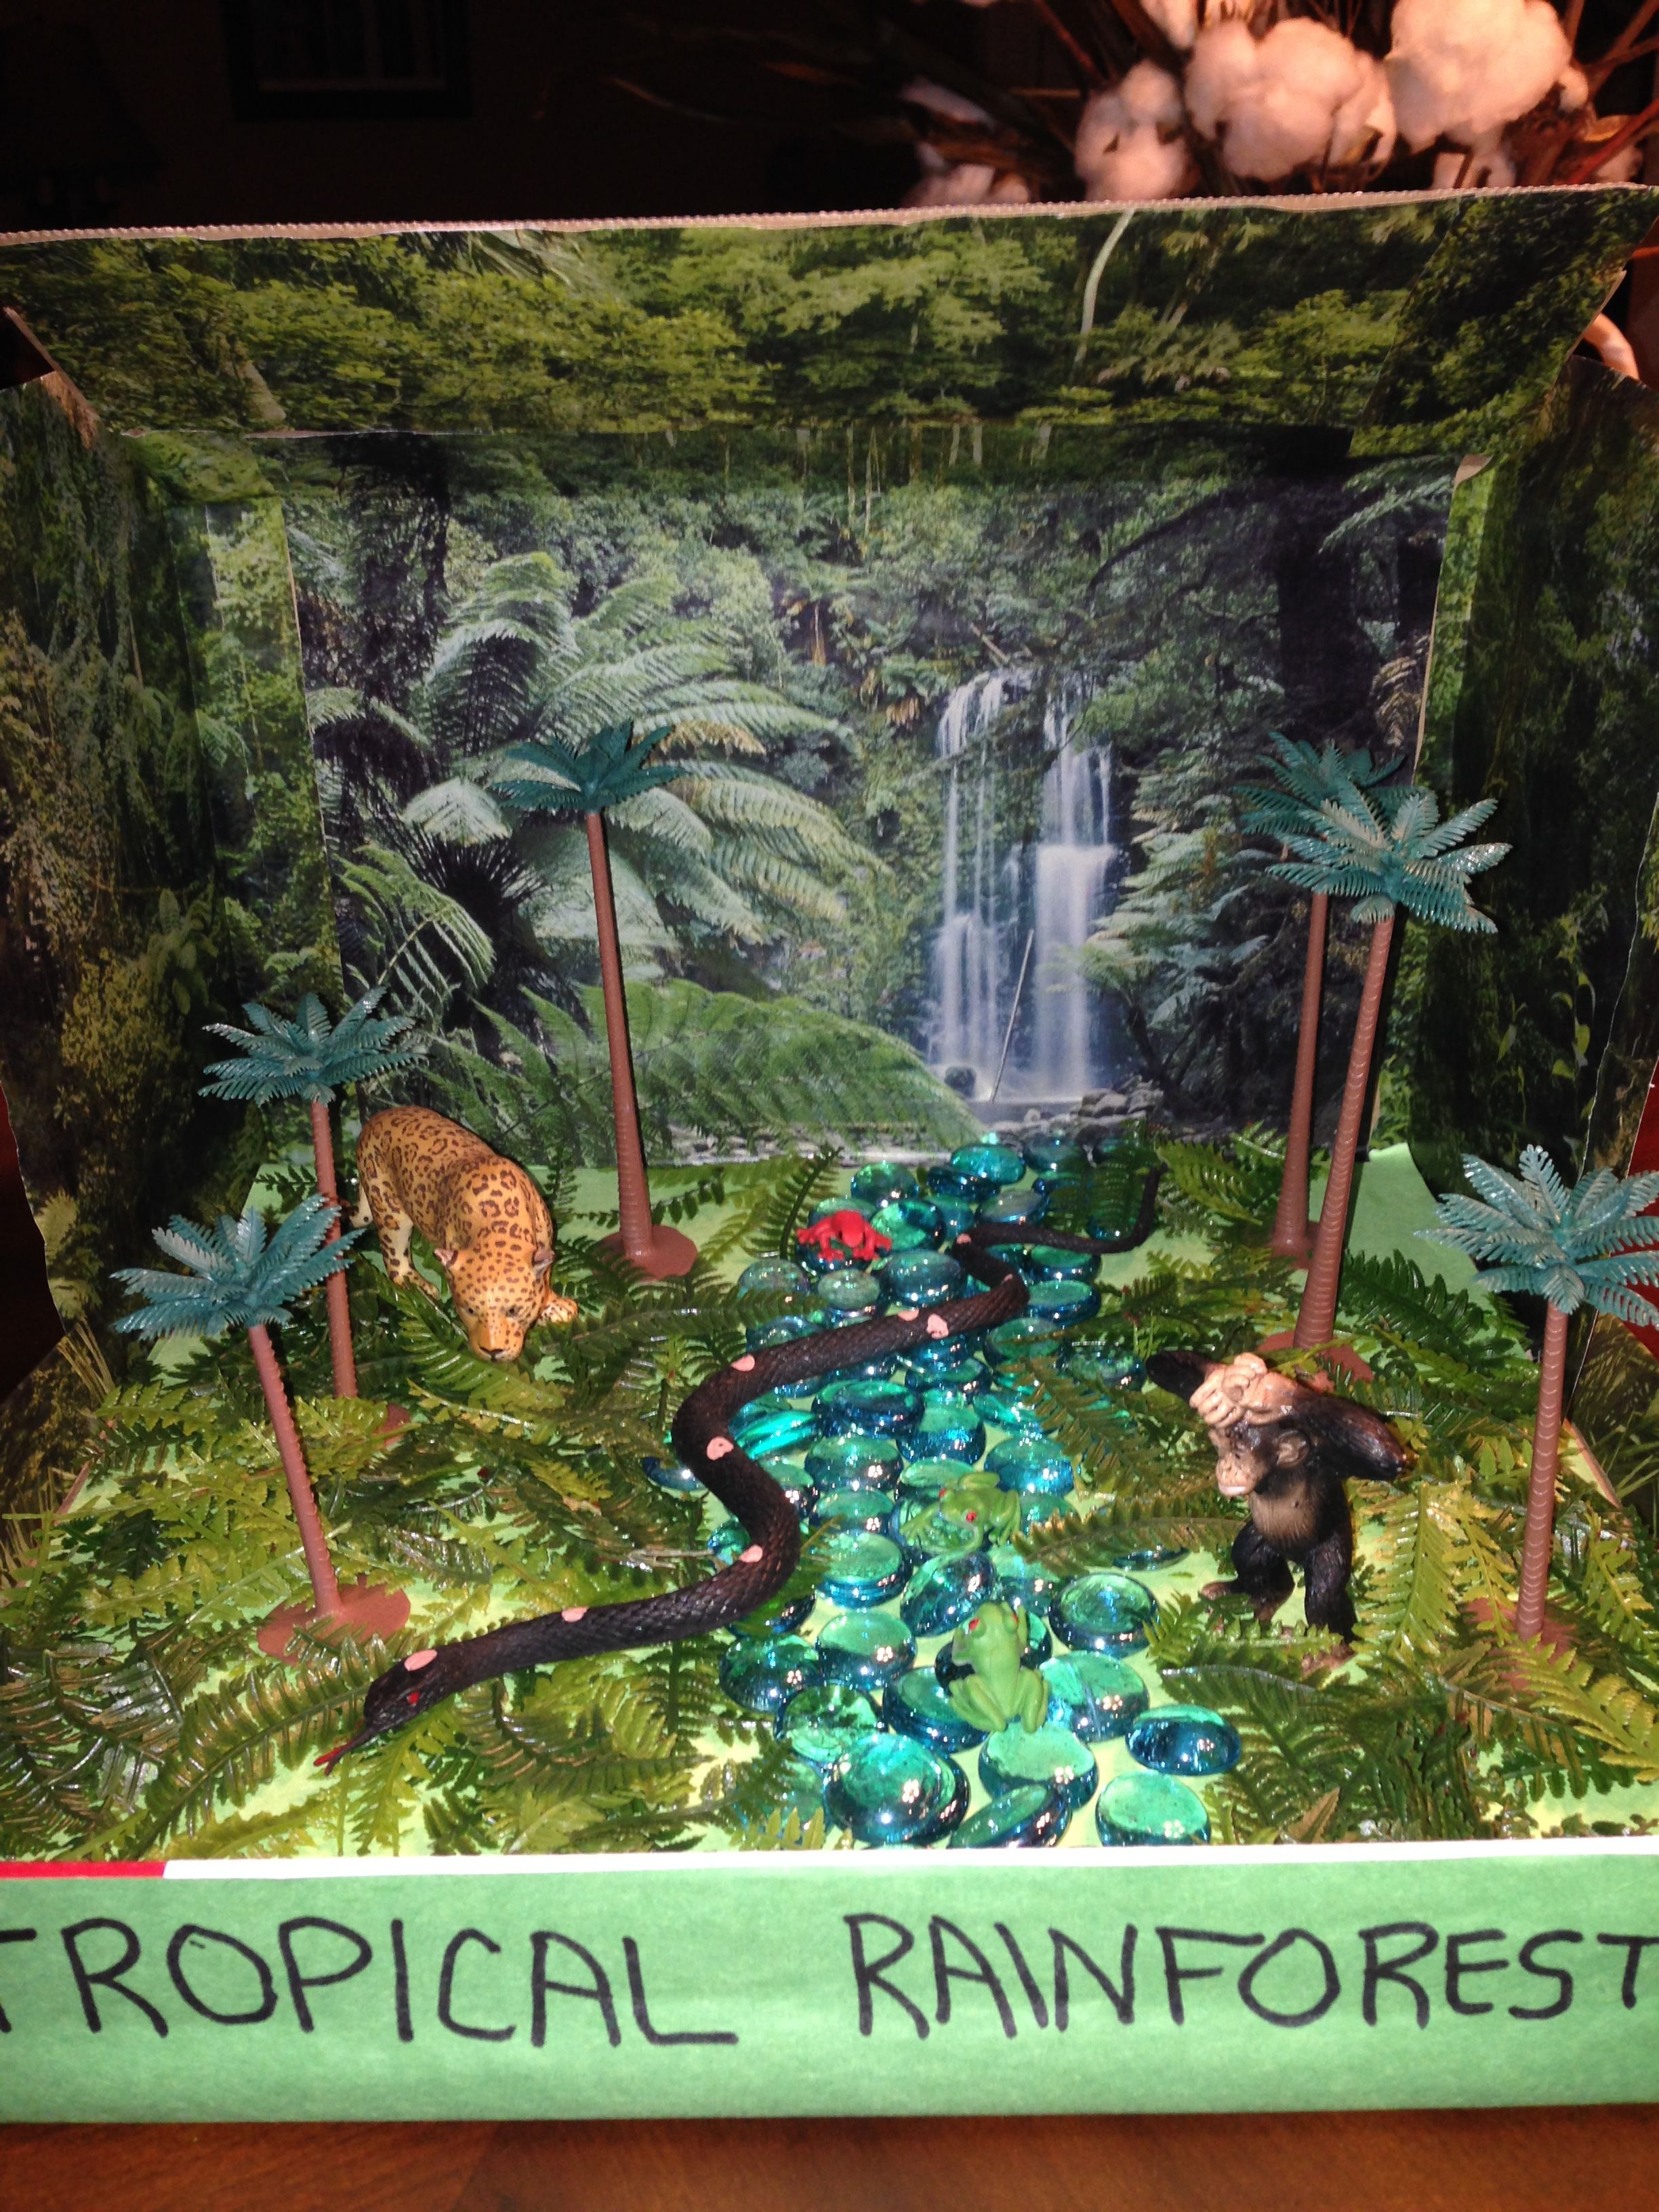 Rainforest Biome In A Box Dioramaideas Rainforest Biome